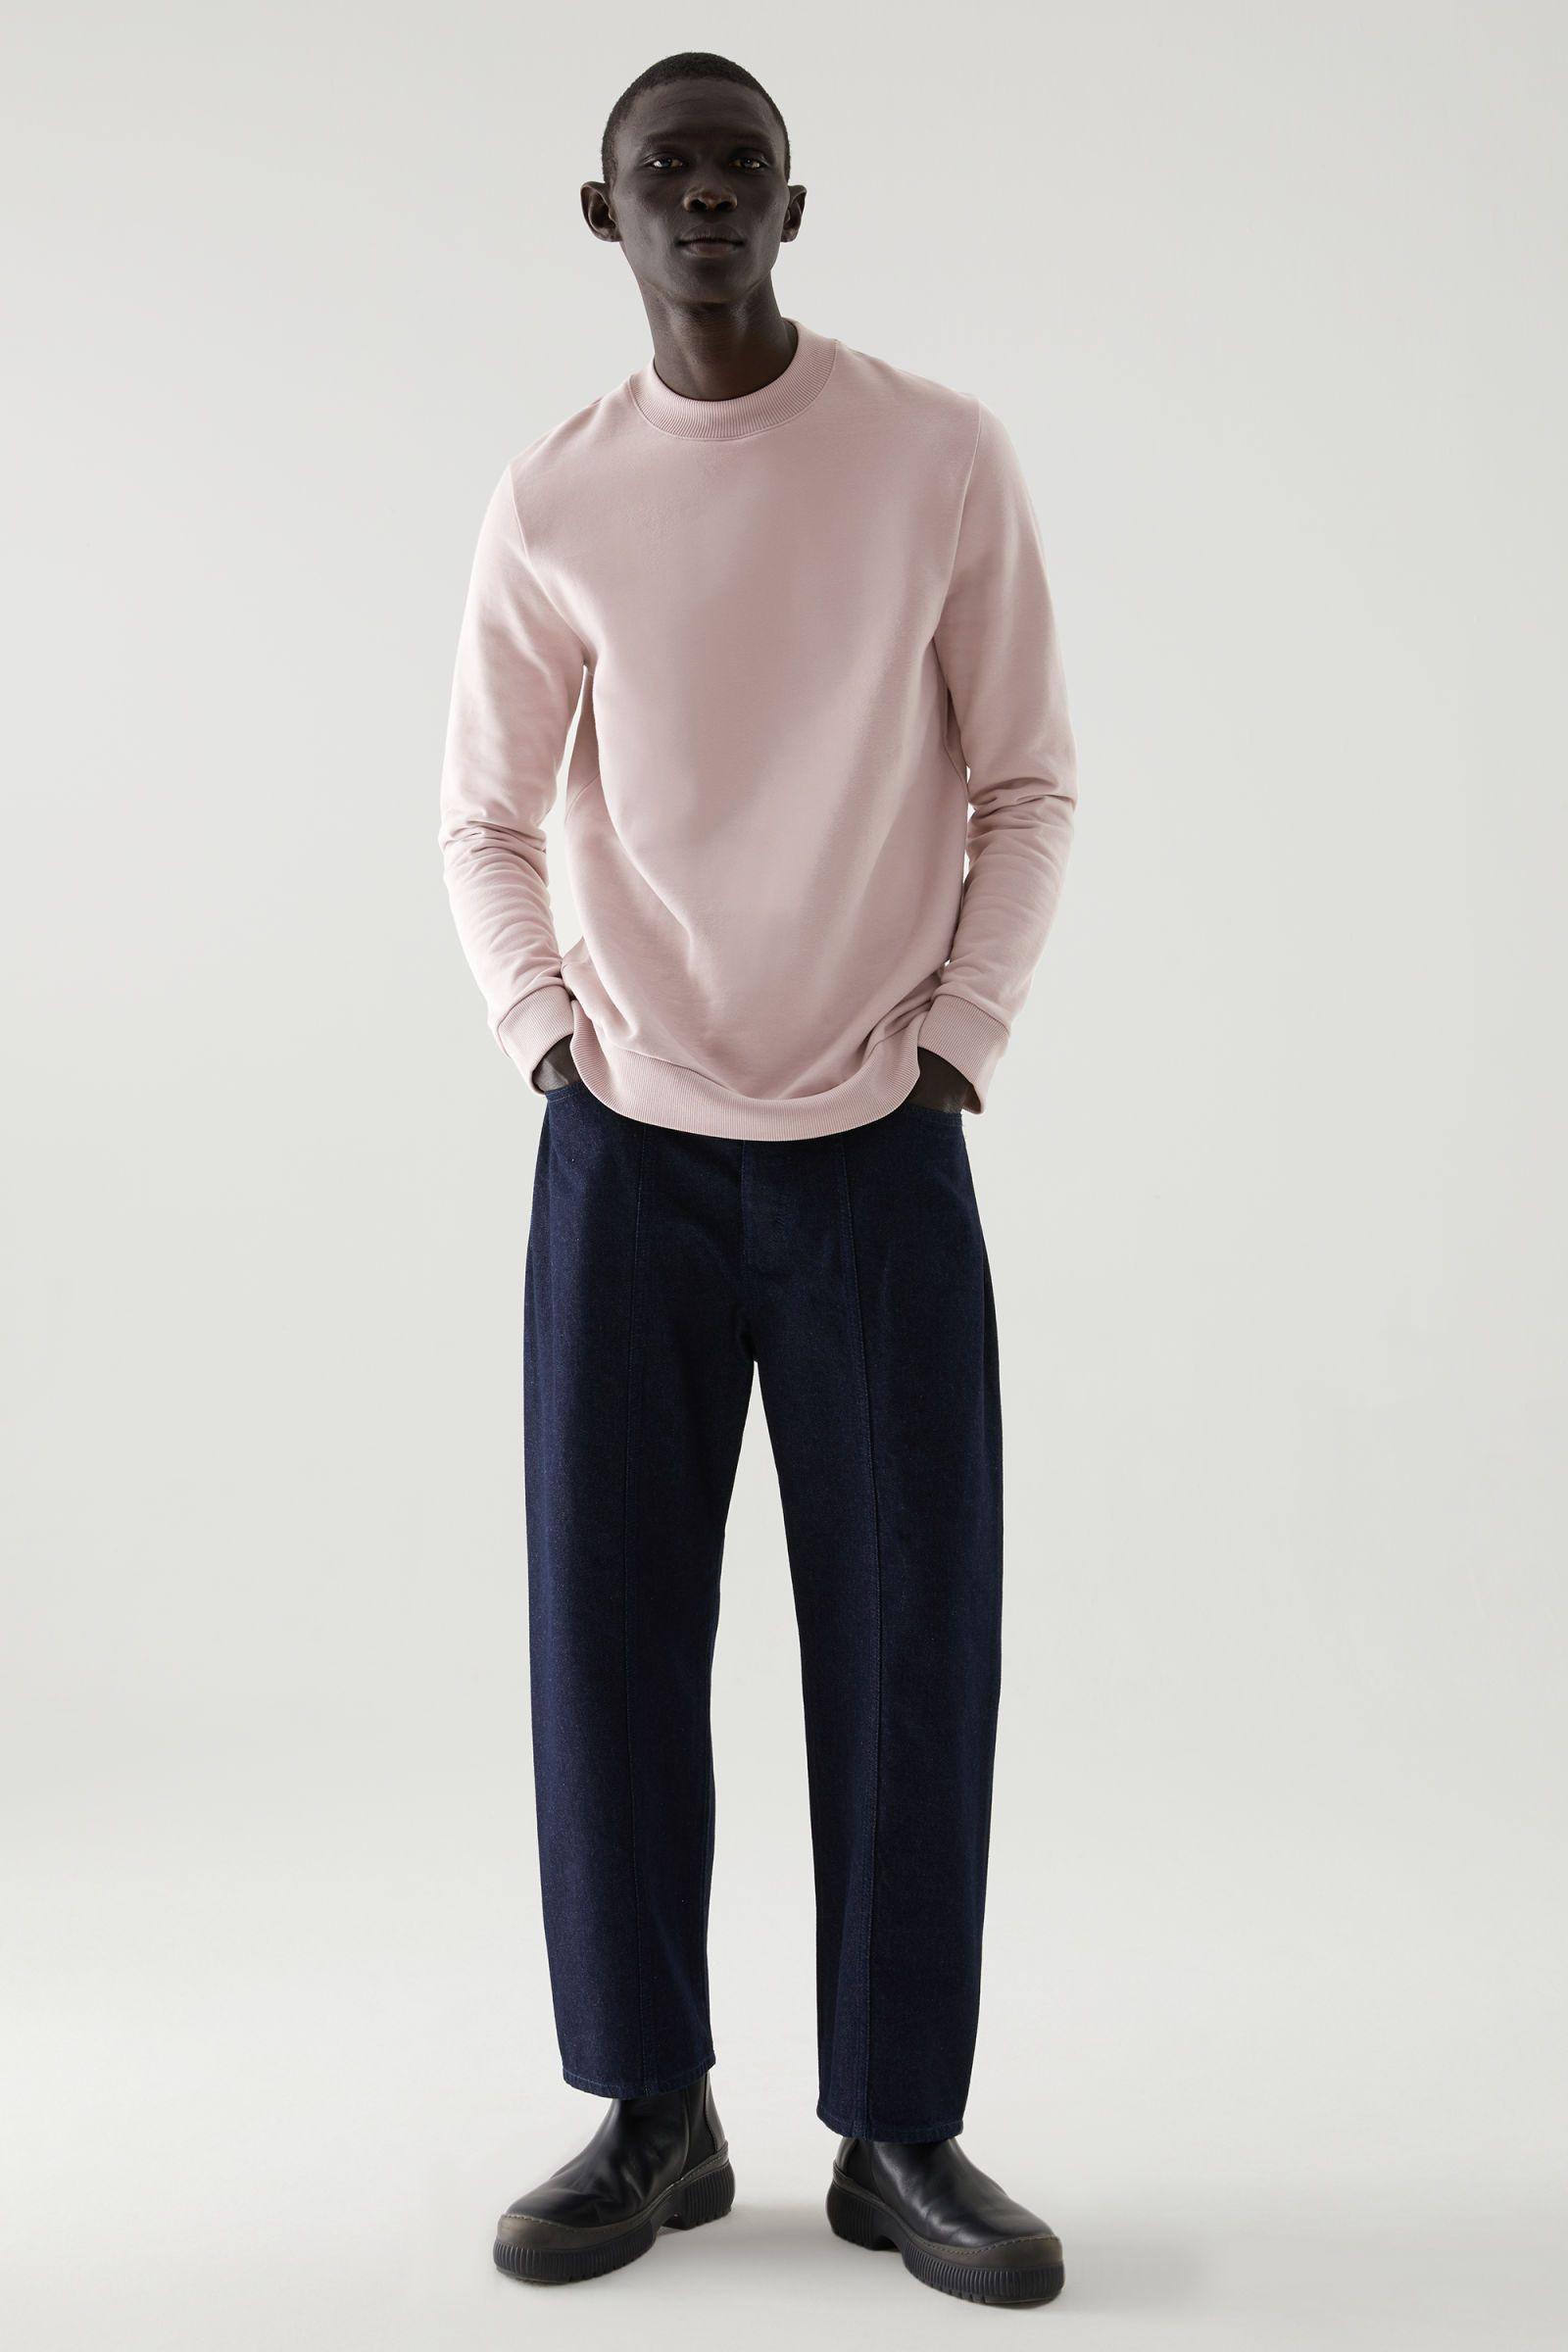 COS Cotton sweatshirt in 2020 Cotton sweatshirts